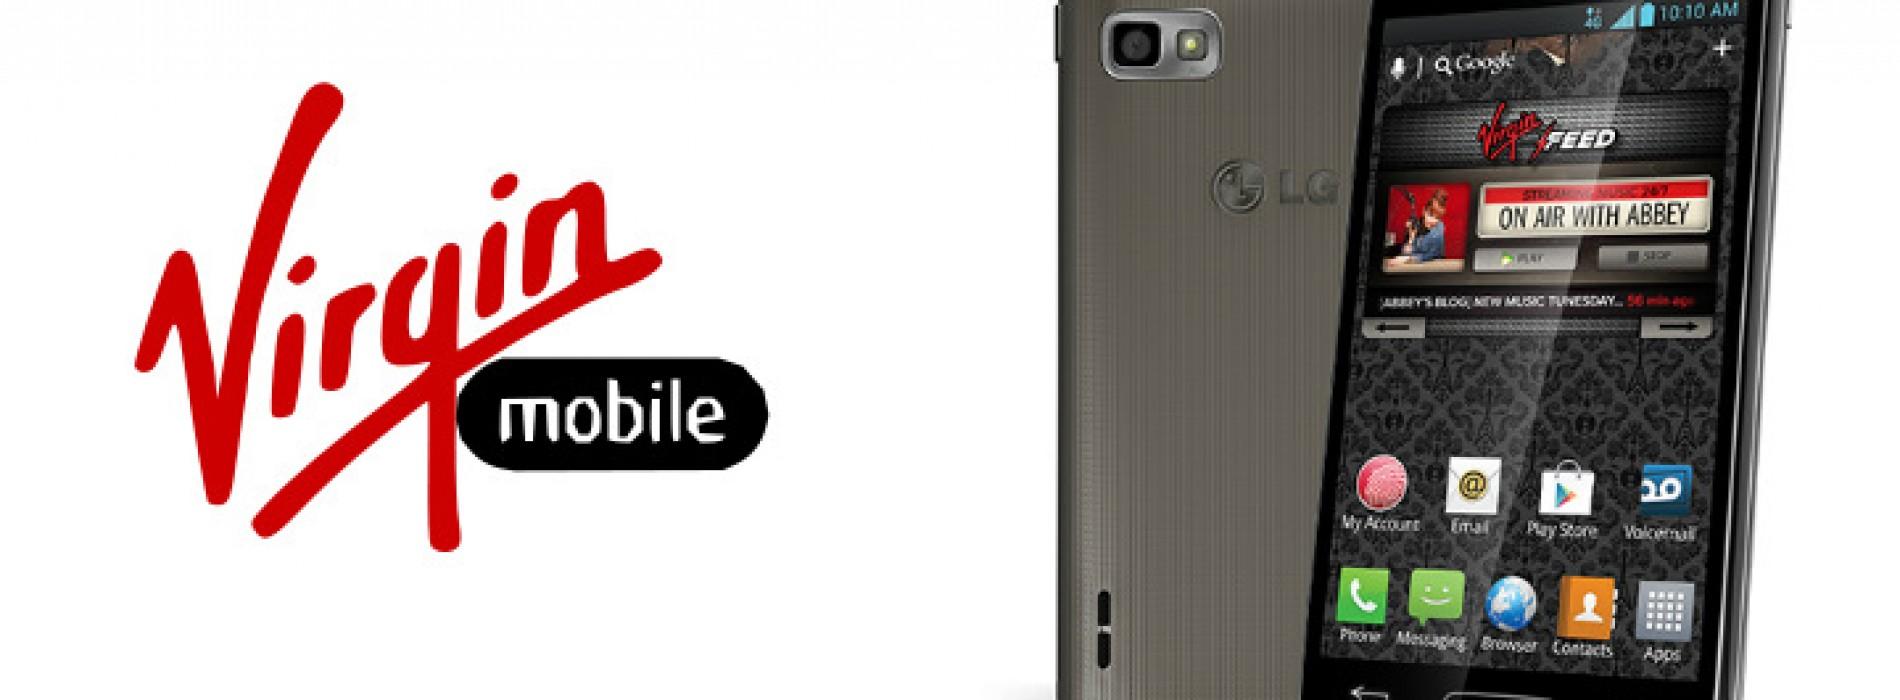 Virgin Mobile now offering LG Optimus F3